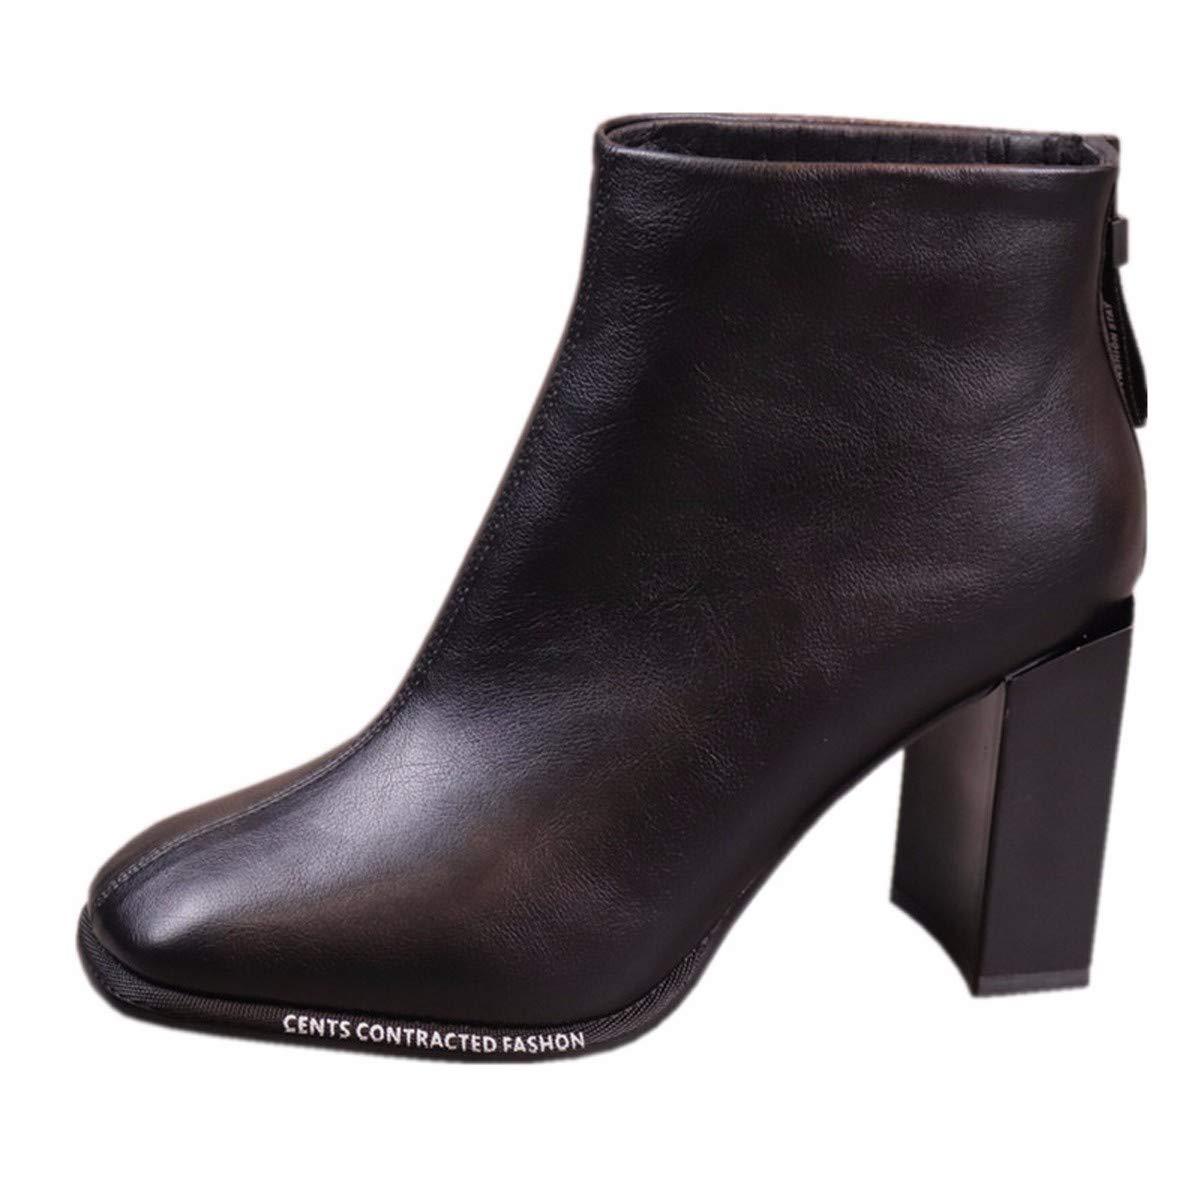 KPHY Damenschuhe Eckige Schwarze Eckige Damenschuhe 8Cm Heel Mode - Stiefeln Dicken Absätzen Winter Mode Briefe Stiefel 2f88e6